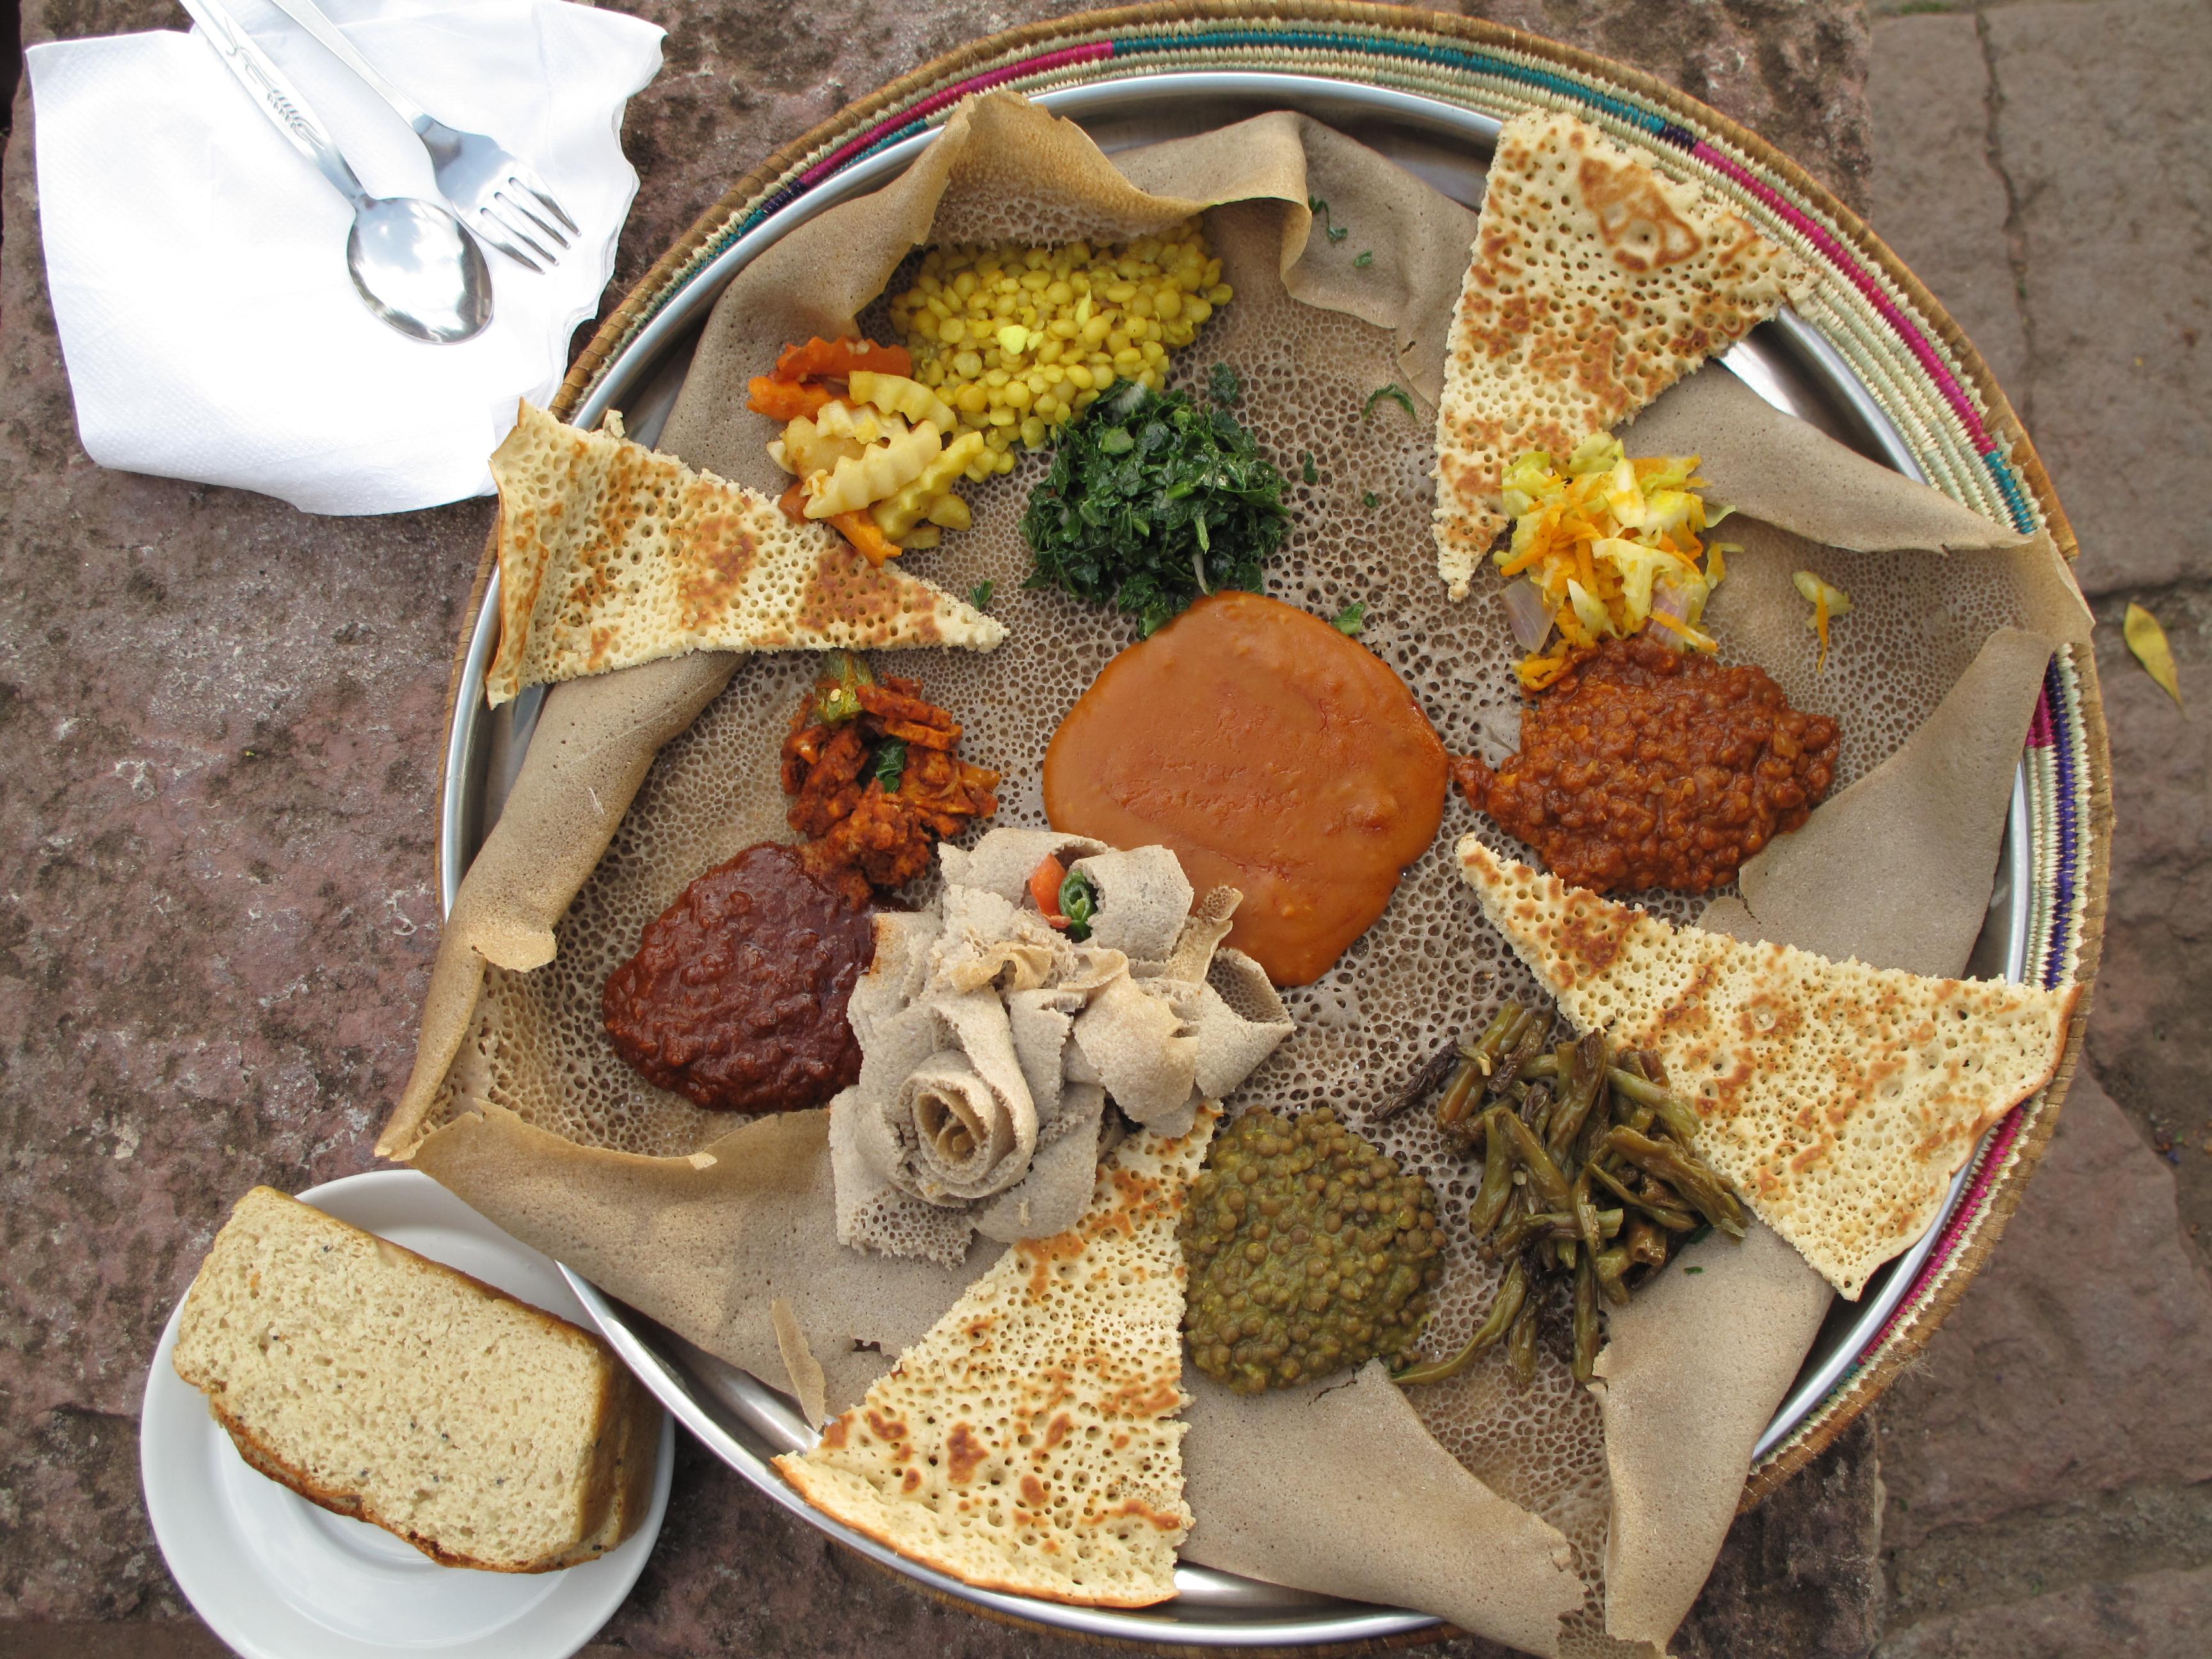 Injera Etiopía fermentados africanos